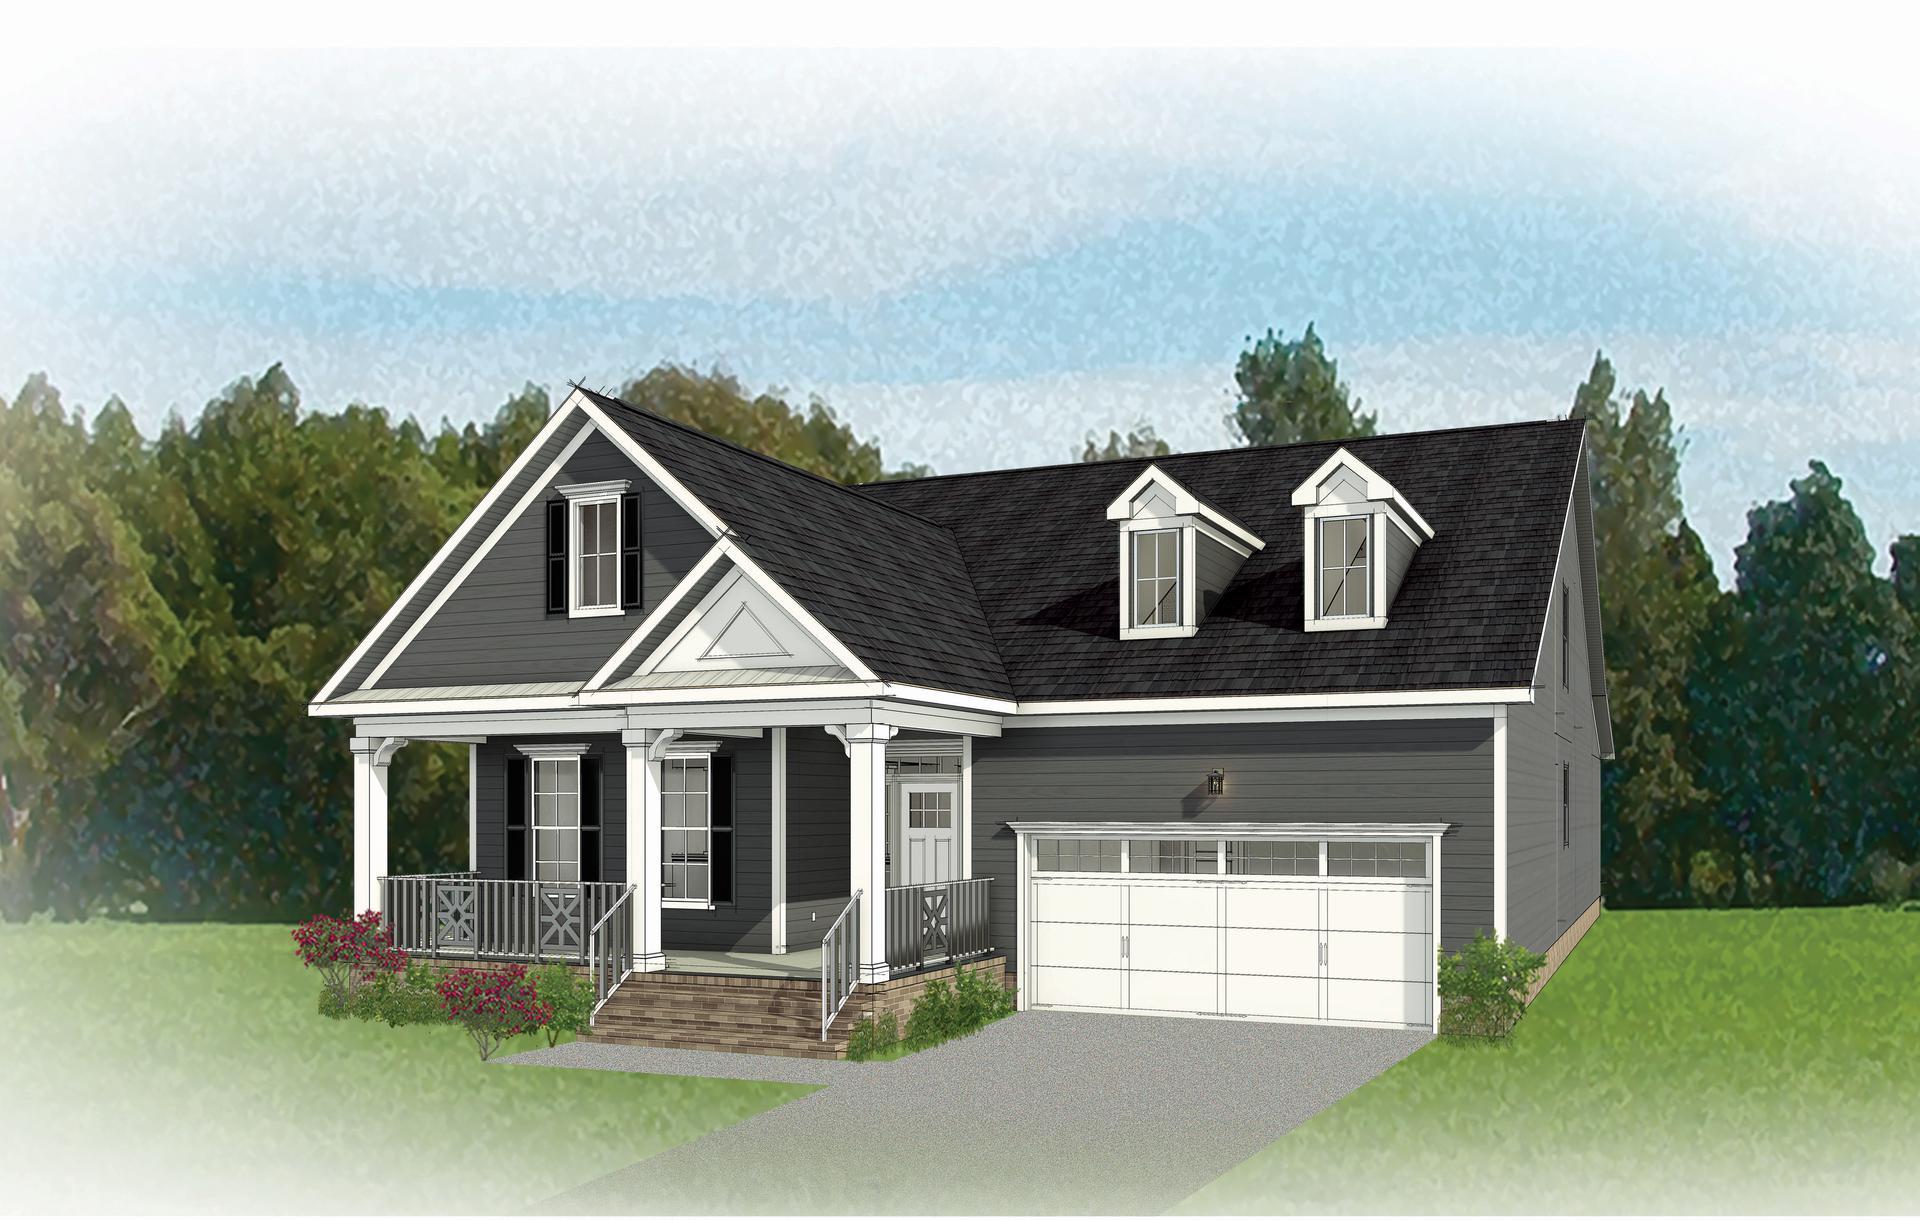 The Hartford II New Home Floorplan